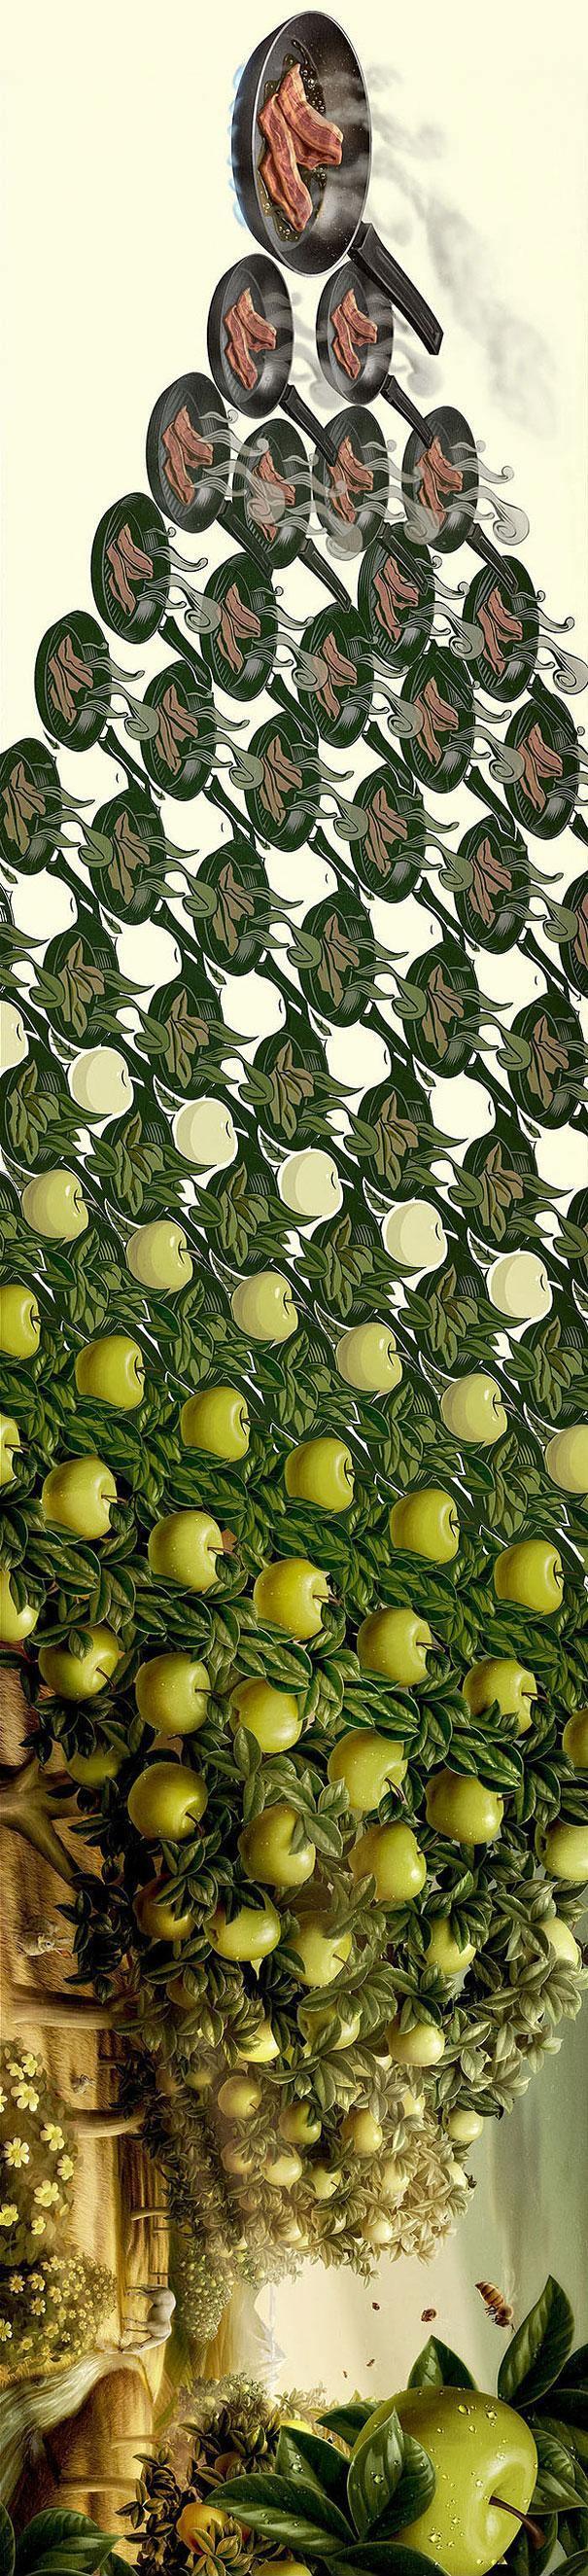 adplus-illustrations-oscar-ramos-3.jpg